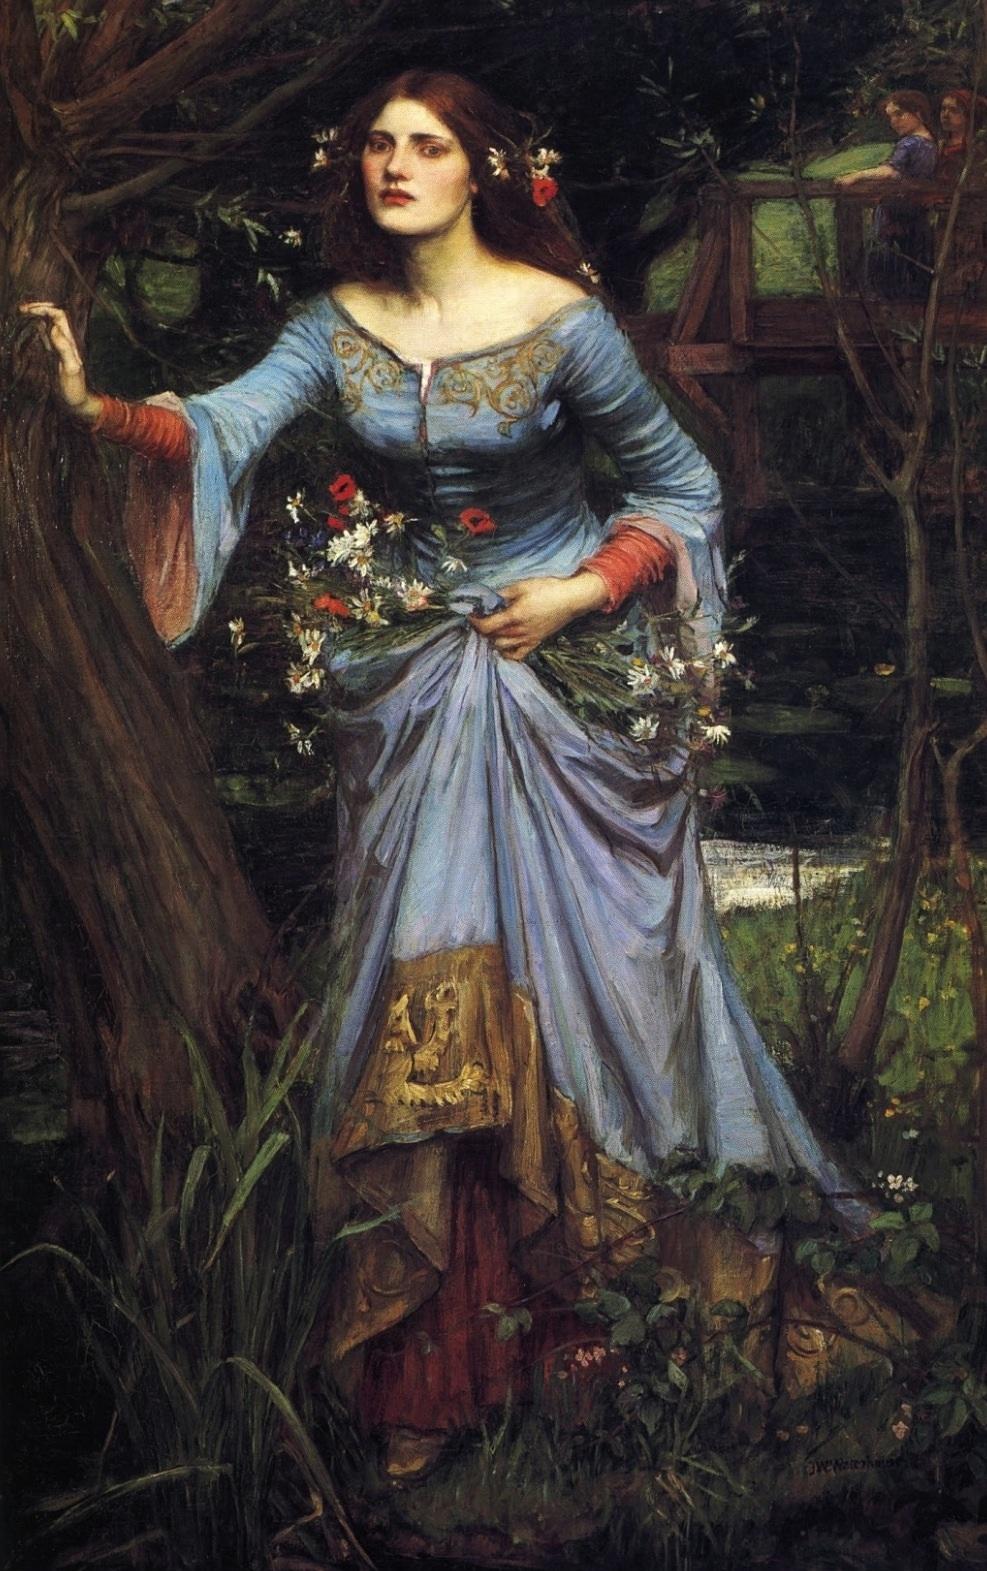 File:John William Waterhouse - Ophelia, 1894.jpg ...  File:John Willi...